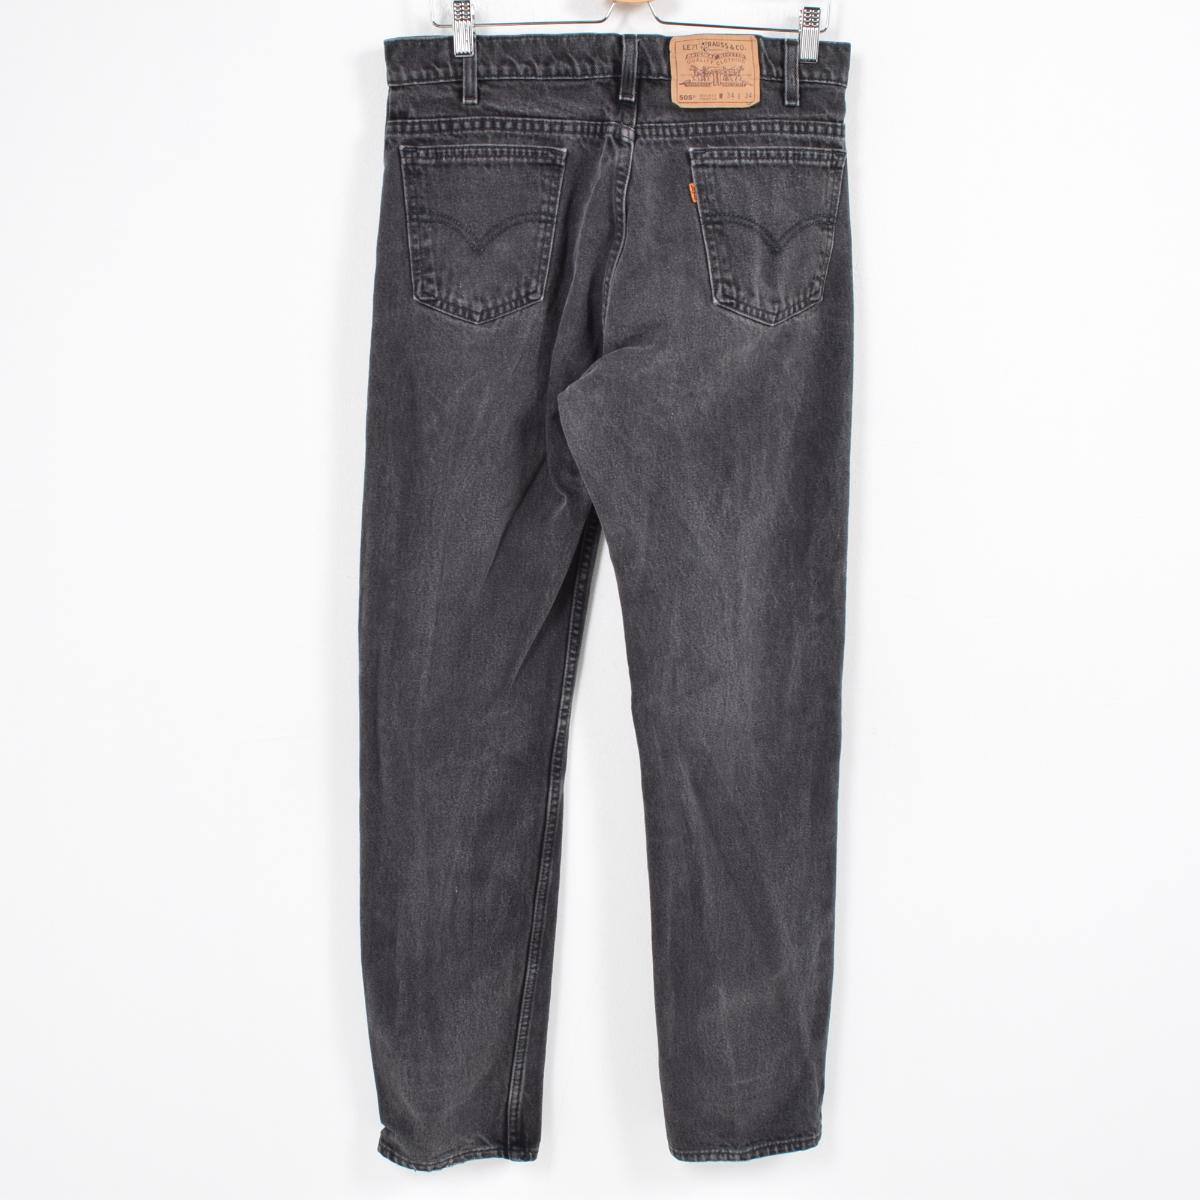 6f6edc8b4ae VINTAGE CLOTHING JAM: Men w34 /wao2235 in the 90s made in Levis Levi's 505  REGULAR FIT STRAIGHT LEG black jeans tapered denim underwear USA | Rakuten  Global ...